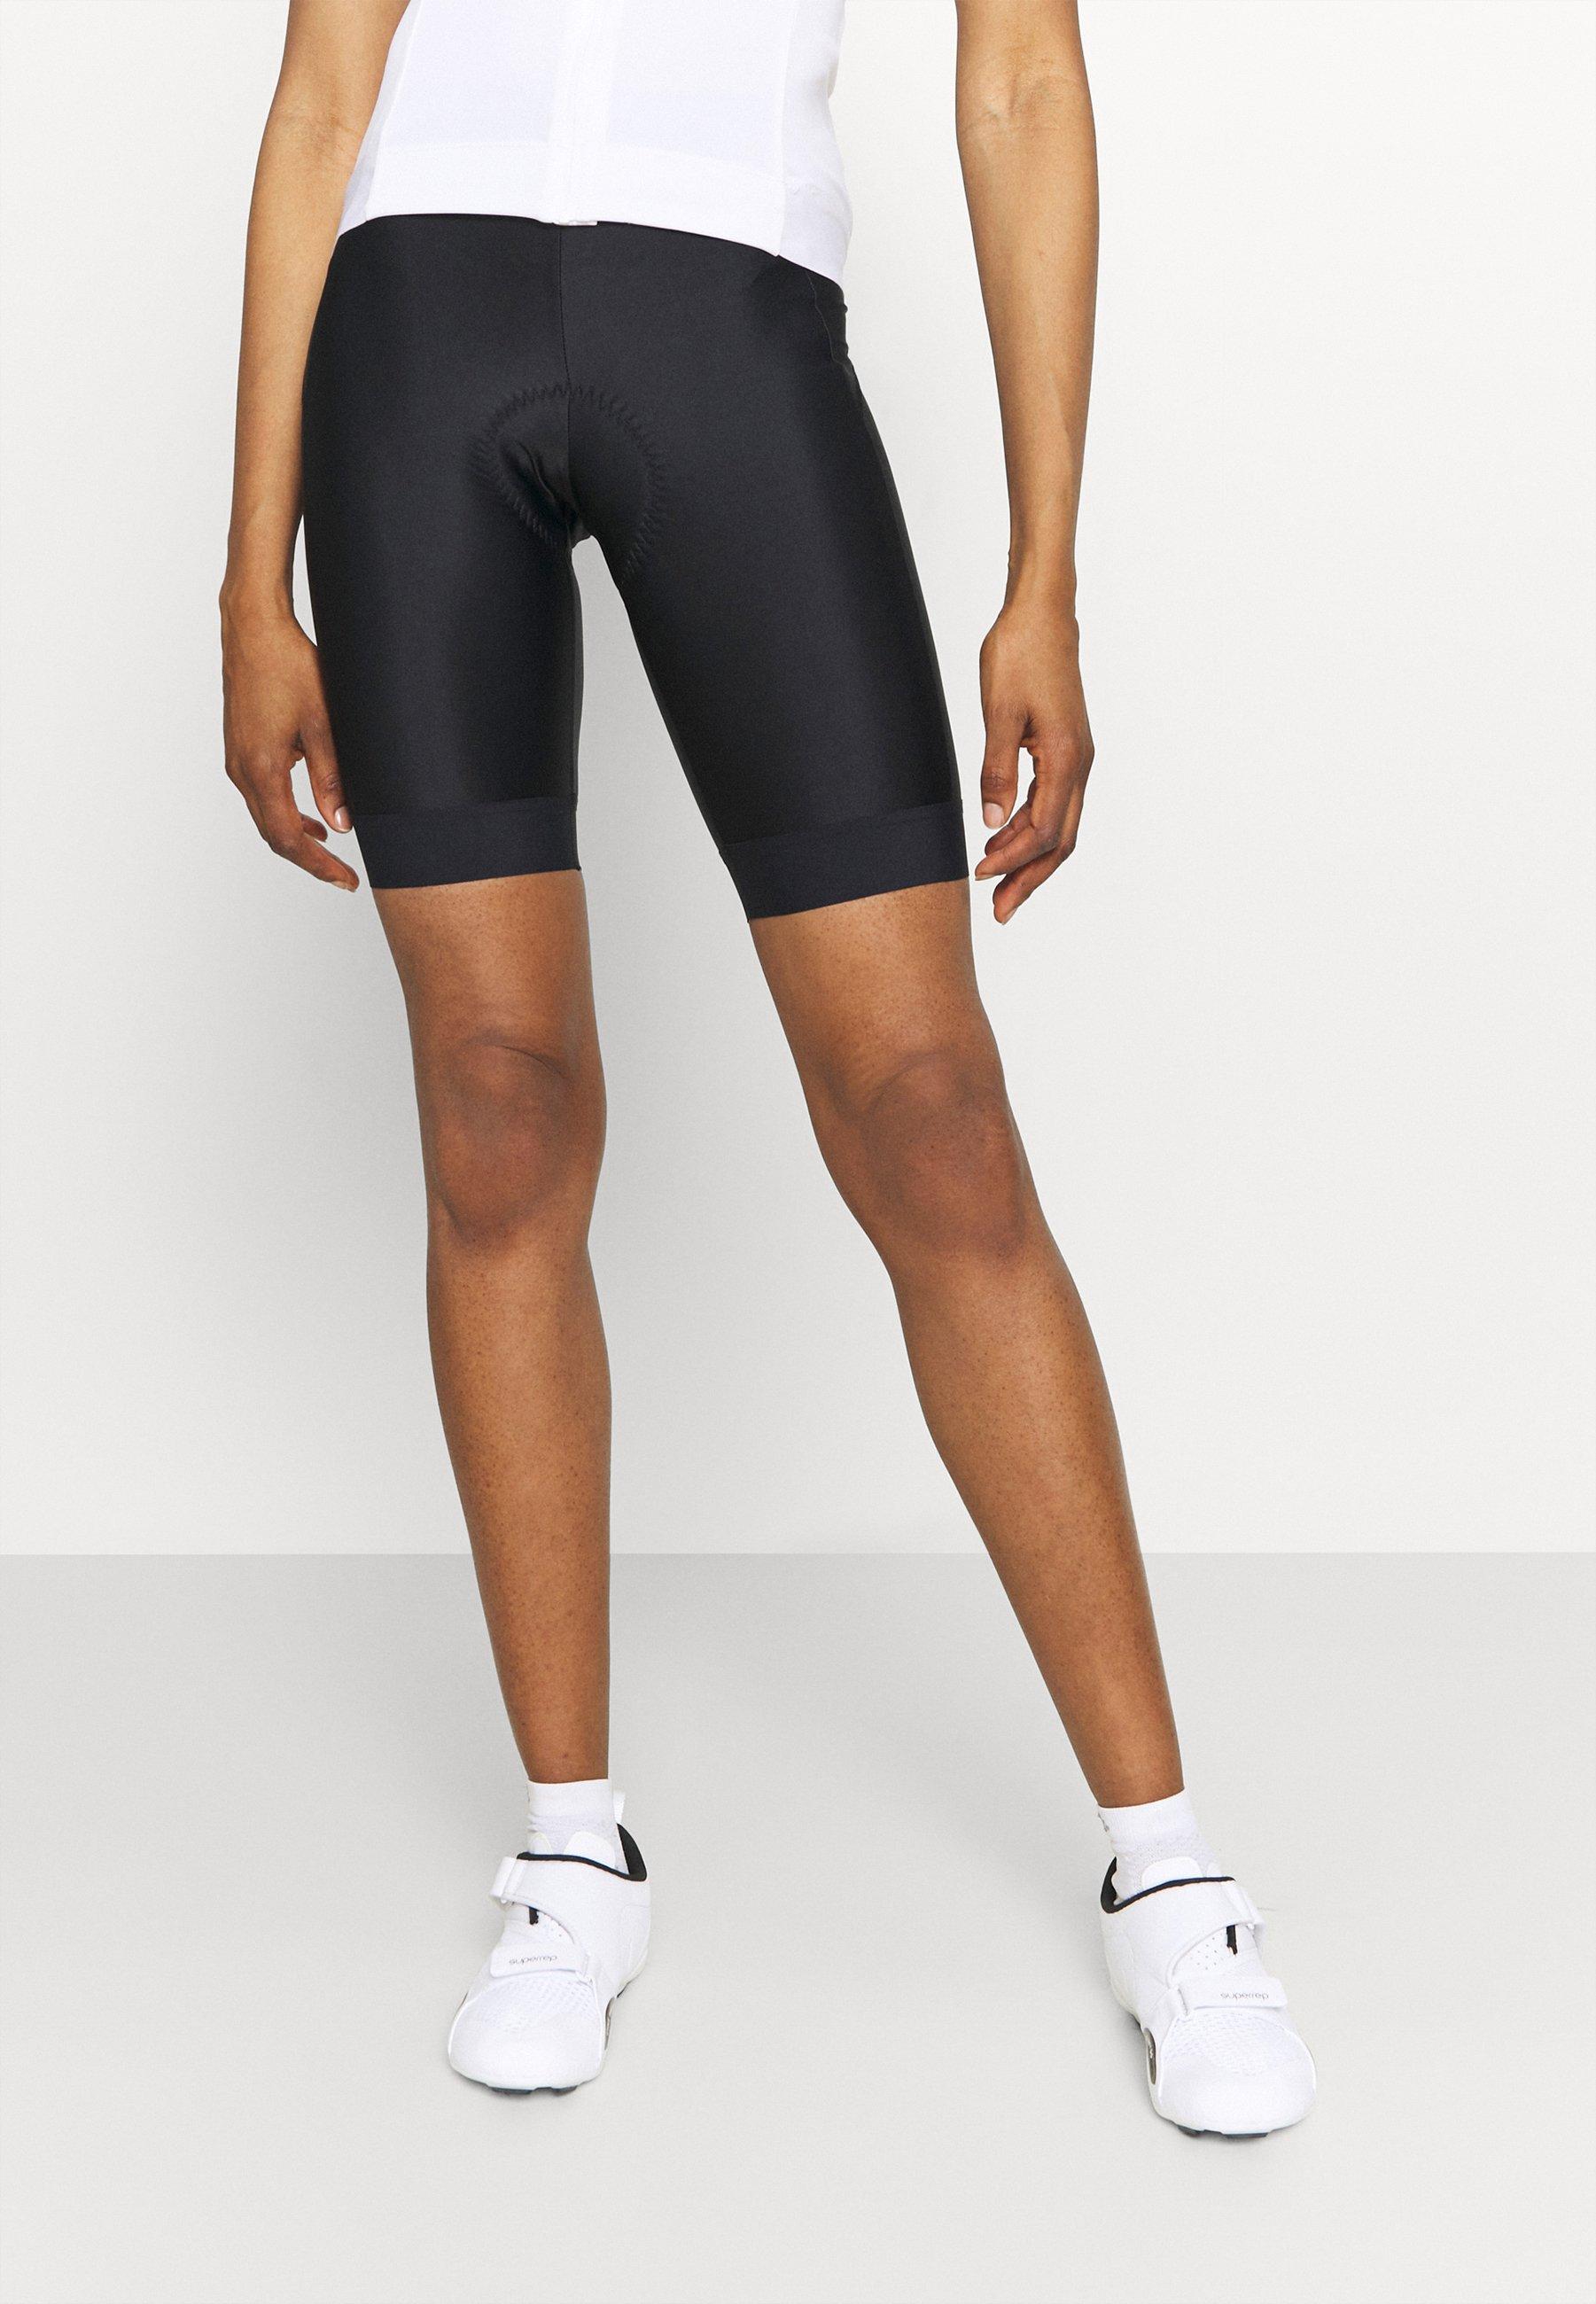 Femme ADVANCED PANTS IV  - Collants